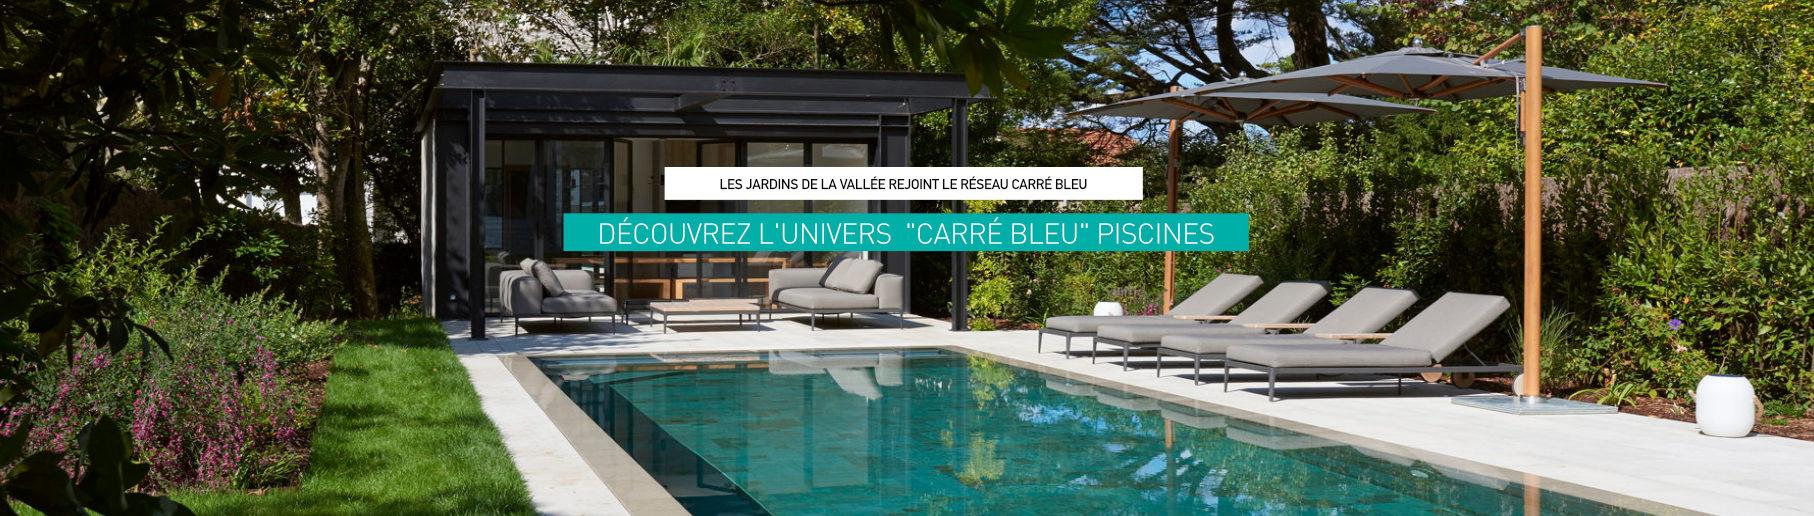 Piscines Carré Bleu